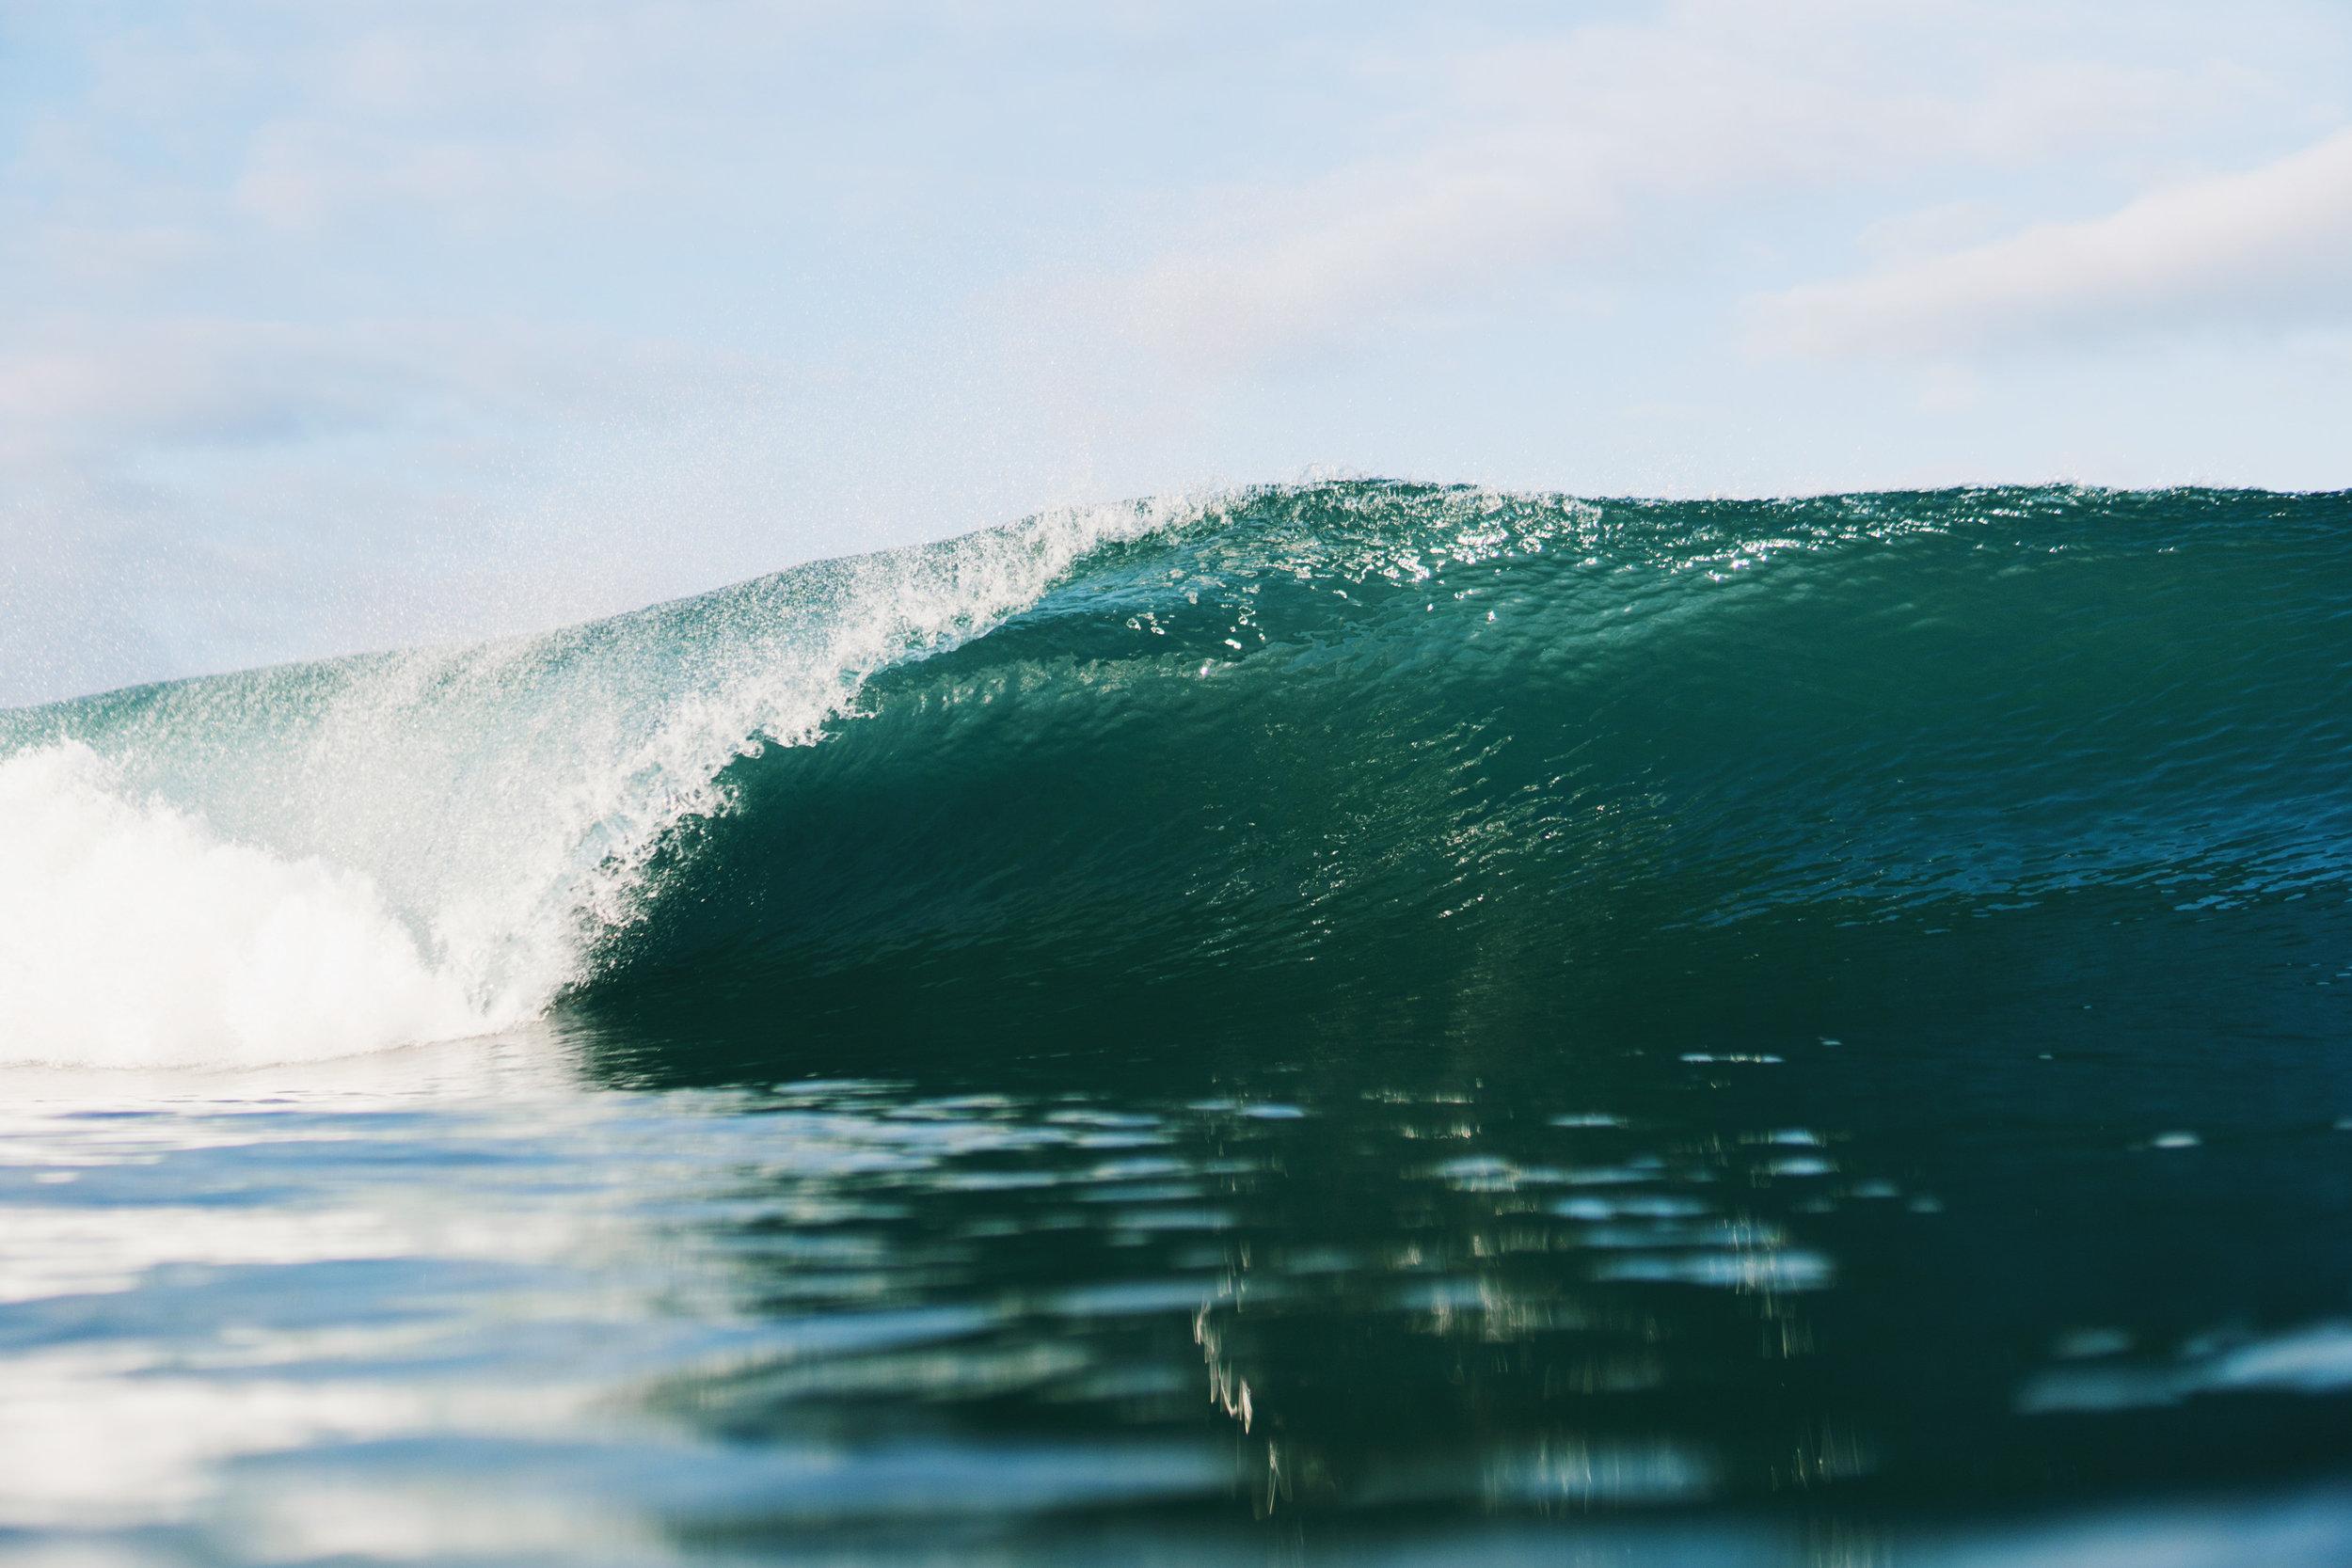 Surf-Mexico-Zihuatanejo-Sayulita-Ixtapa-Zihuatanejo-Diego-Cadena-Olas-Fotografia-Heiko-Bothe-68.jpg